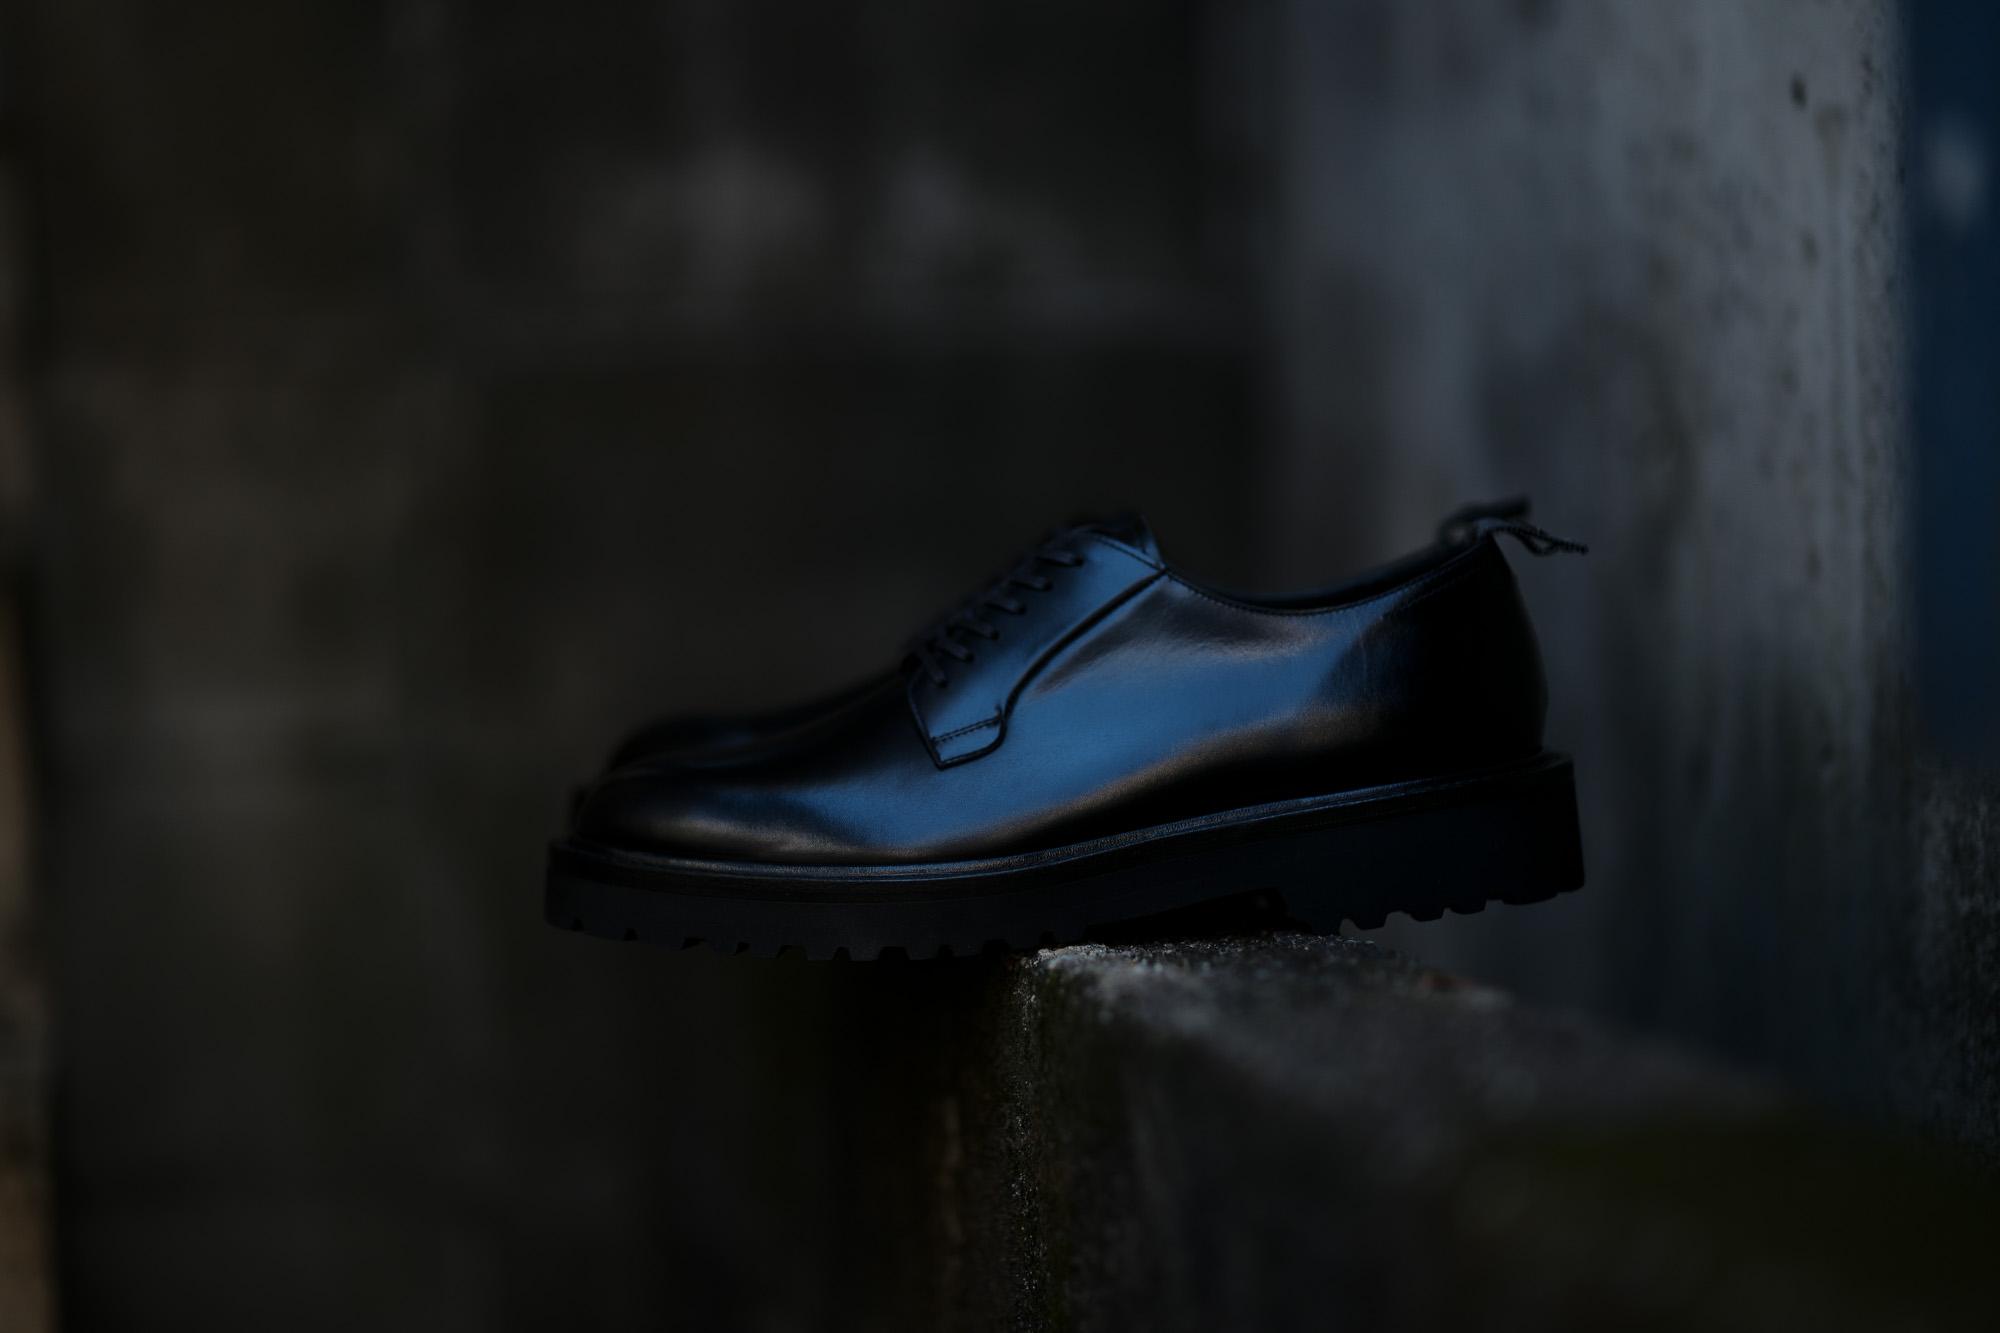 WH (ダブルエイチ) WHS-0001 Plane Toe Shoes (干場氏 スペシャル モデル) Cruise Last (クルーズラスト) ANNONAY Vocalou Calf Leather プレーントゥシューズ BLACK (ブラック) MADE IN JAPAN(日本製) 2019 春夏新作 wh 干場さん 干場スペシャル FORZASTYLE フォルザスタイル 愛知 名古屋 東京 大阪 Alto e Diritto アルト エ デリット